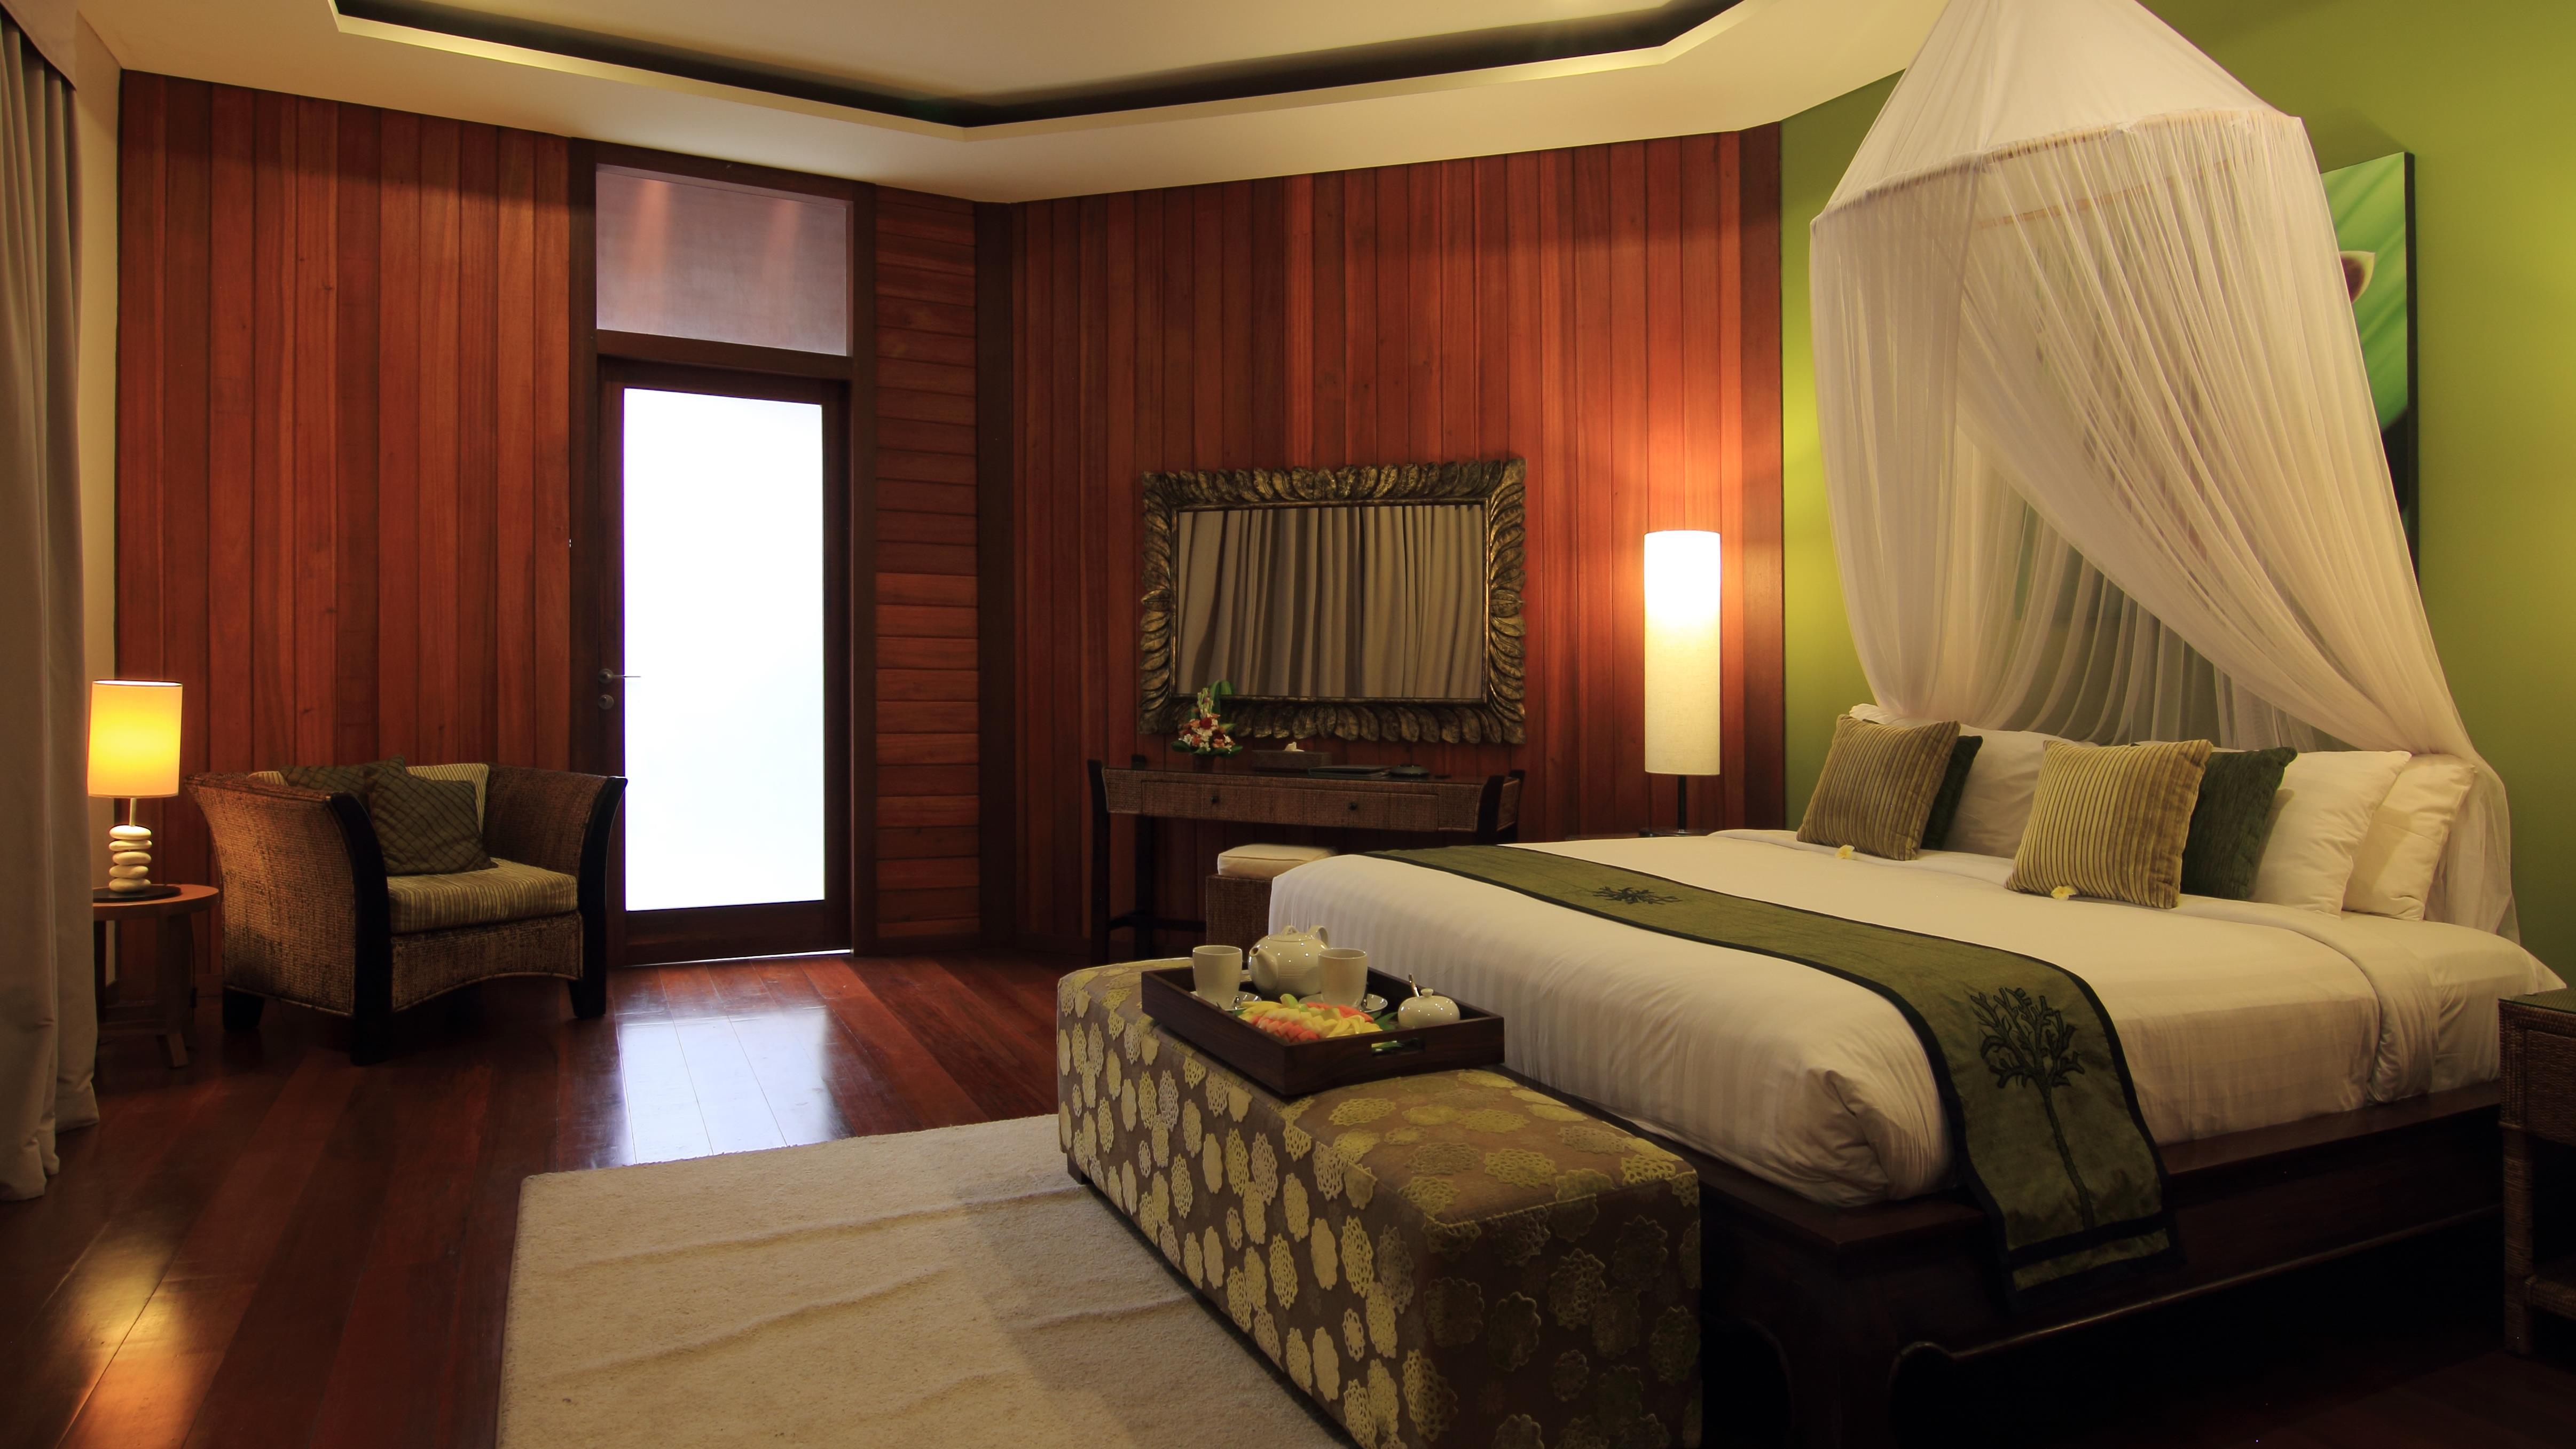 Bedroom with Seating Area and Wooden Floor - Umah Di Sawah - Canggu, Bali